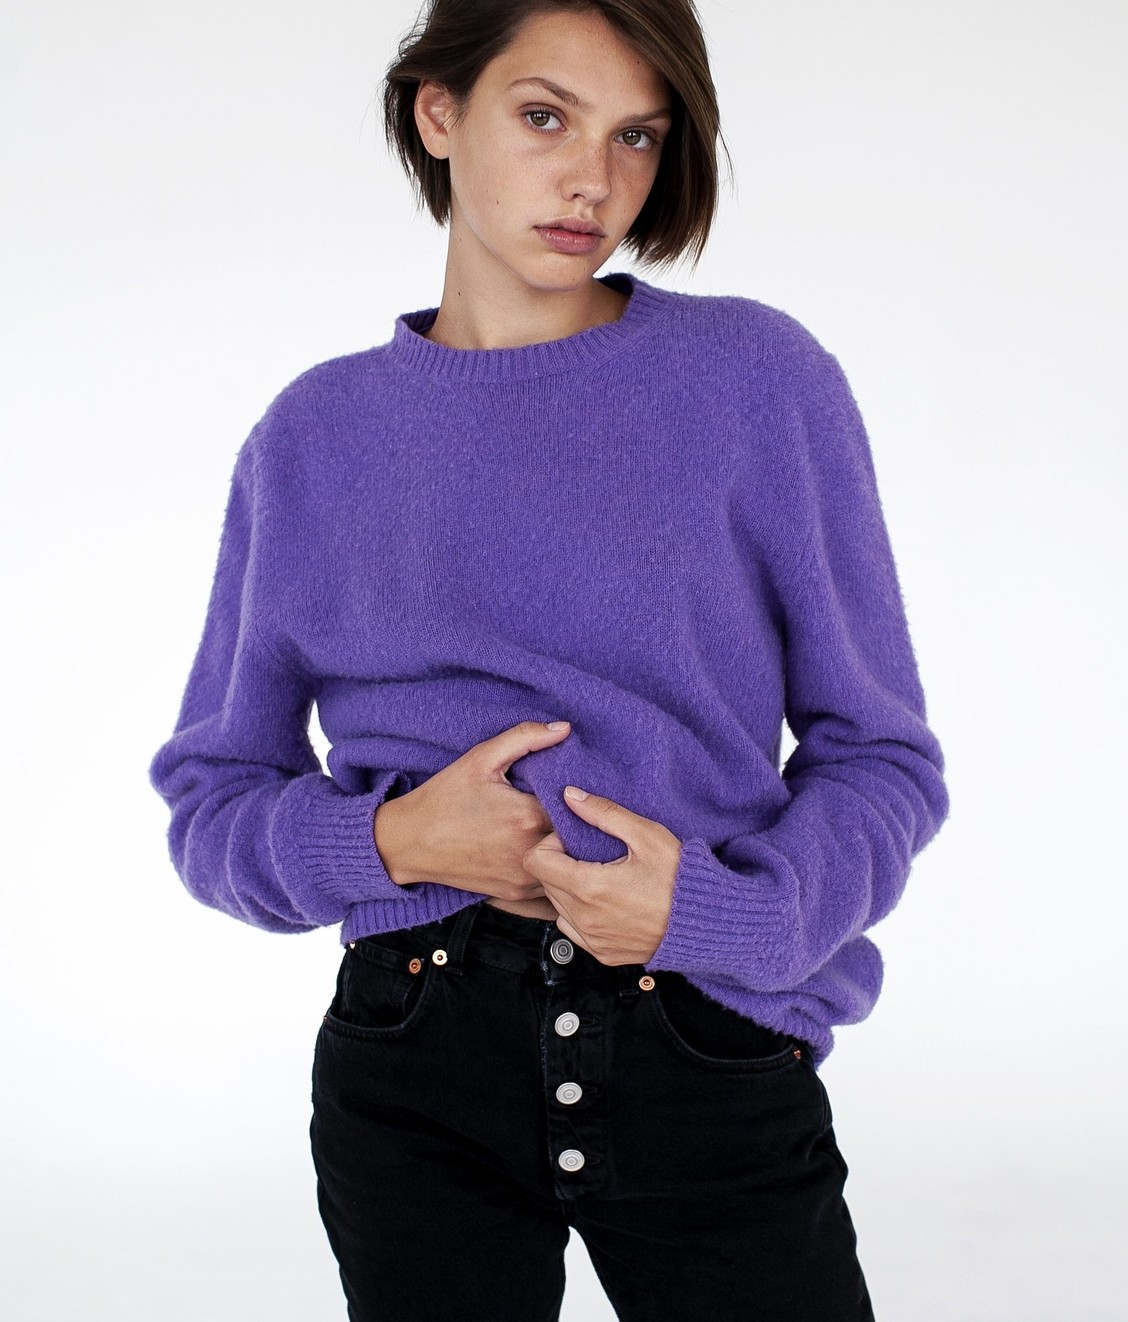 Harmony X Emily Winston Knit Purple